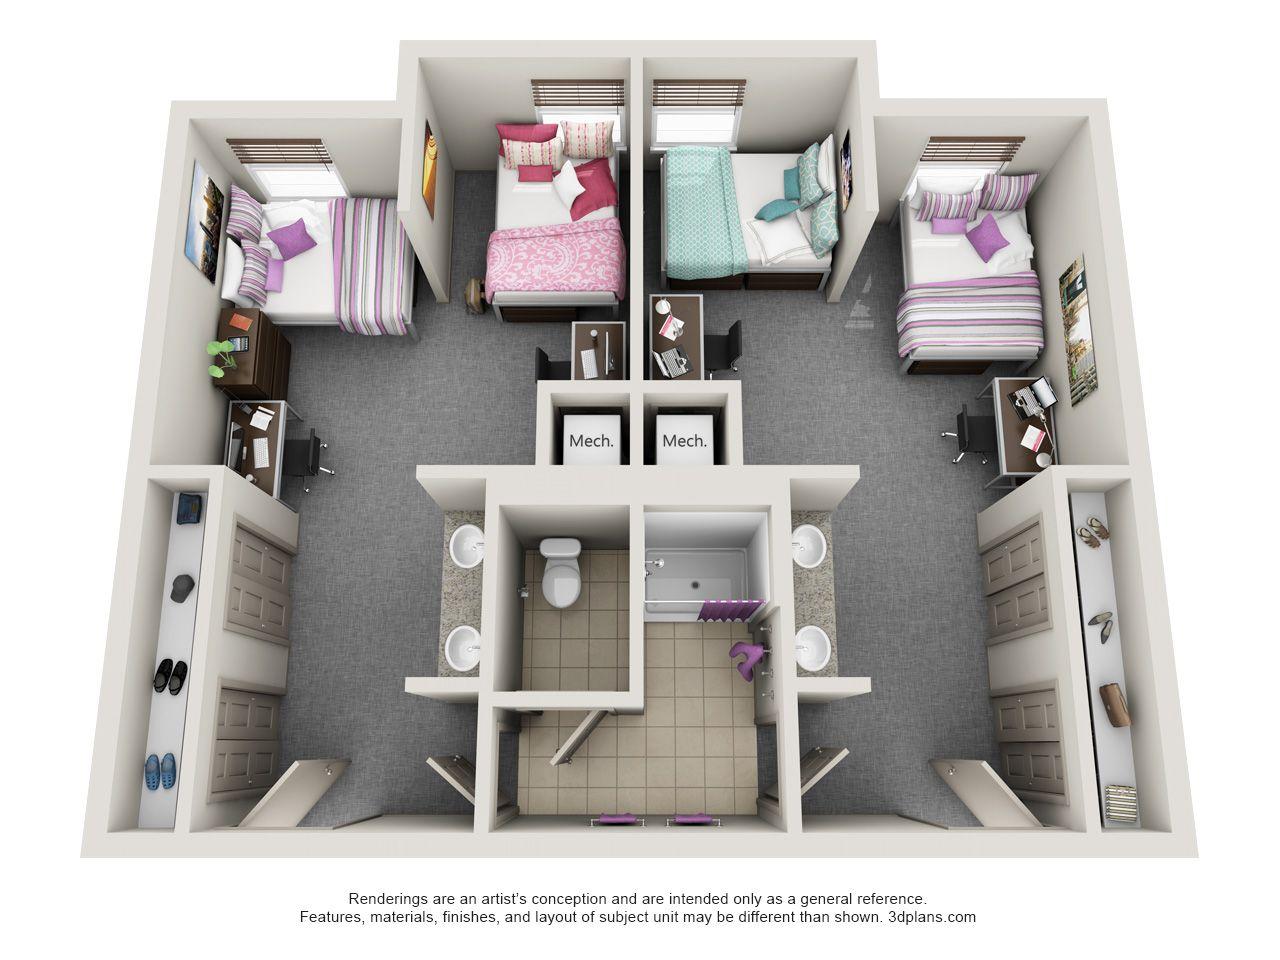 4personsuite Haggin Jpg 1280 960 Dorm Room Layouts Dorm Layout Dorm Design